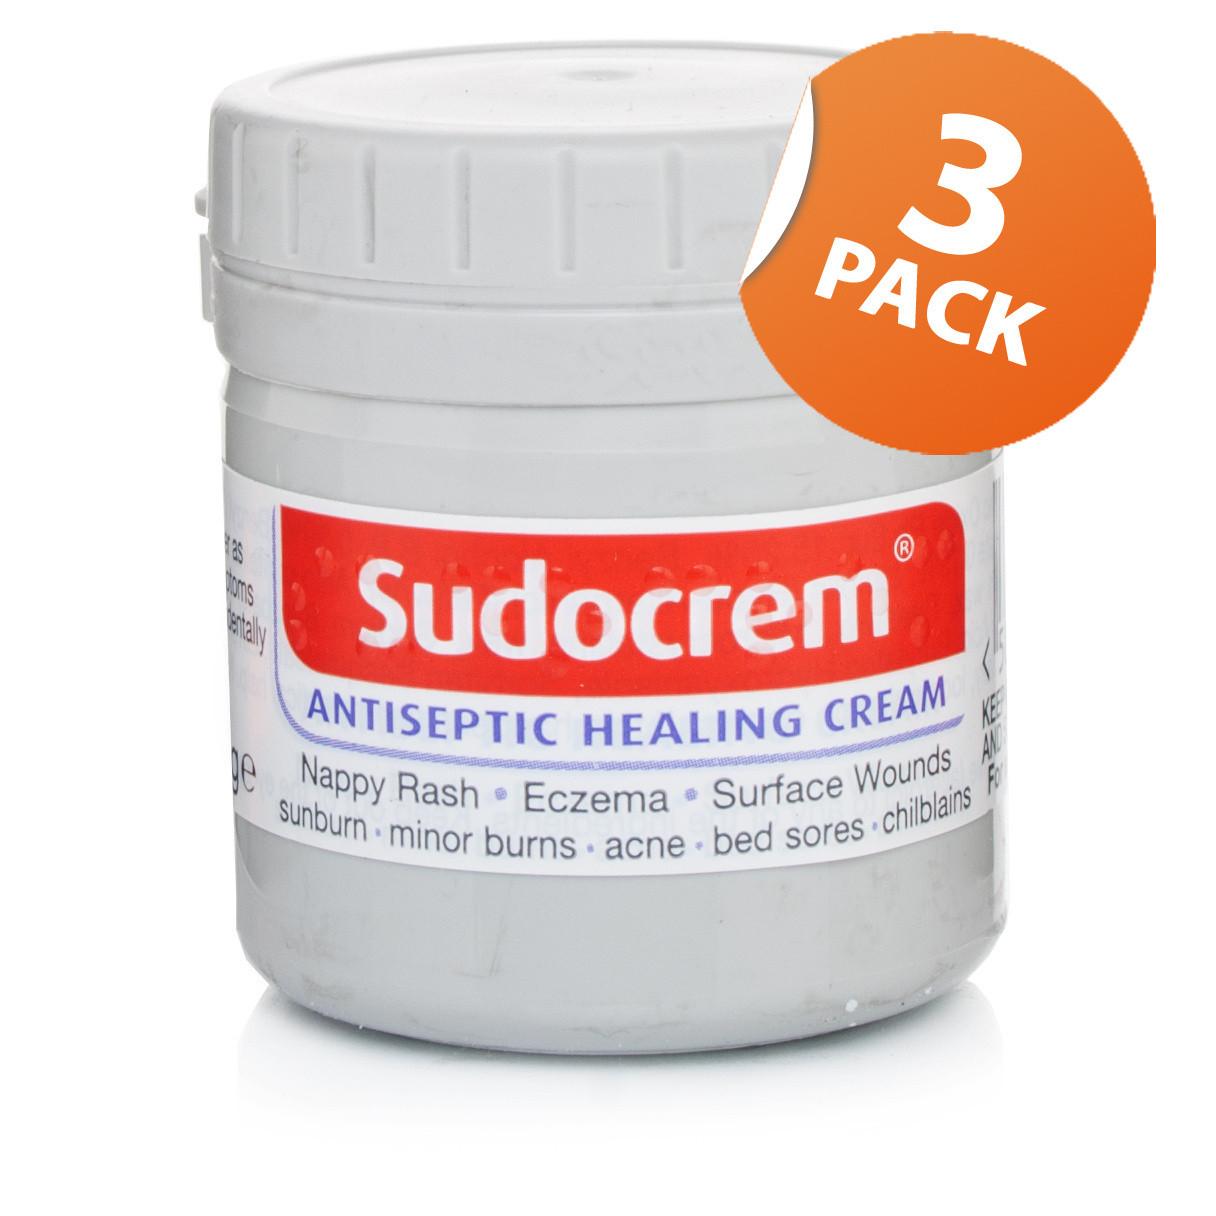 Sudocrem Antiseptic Healing Cream  Triple Pack